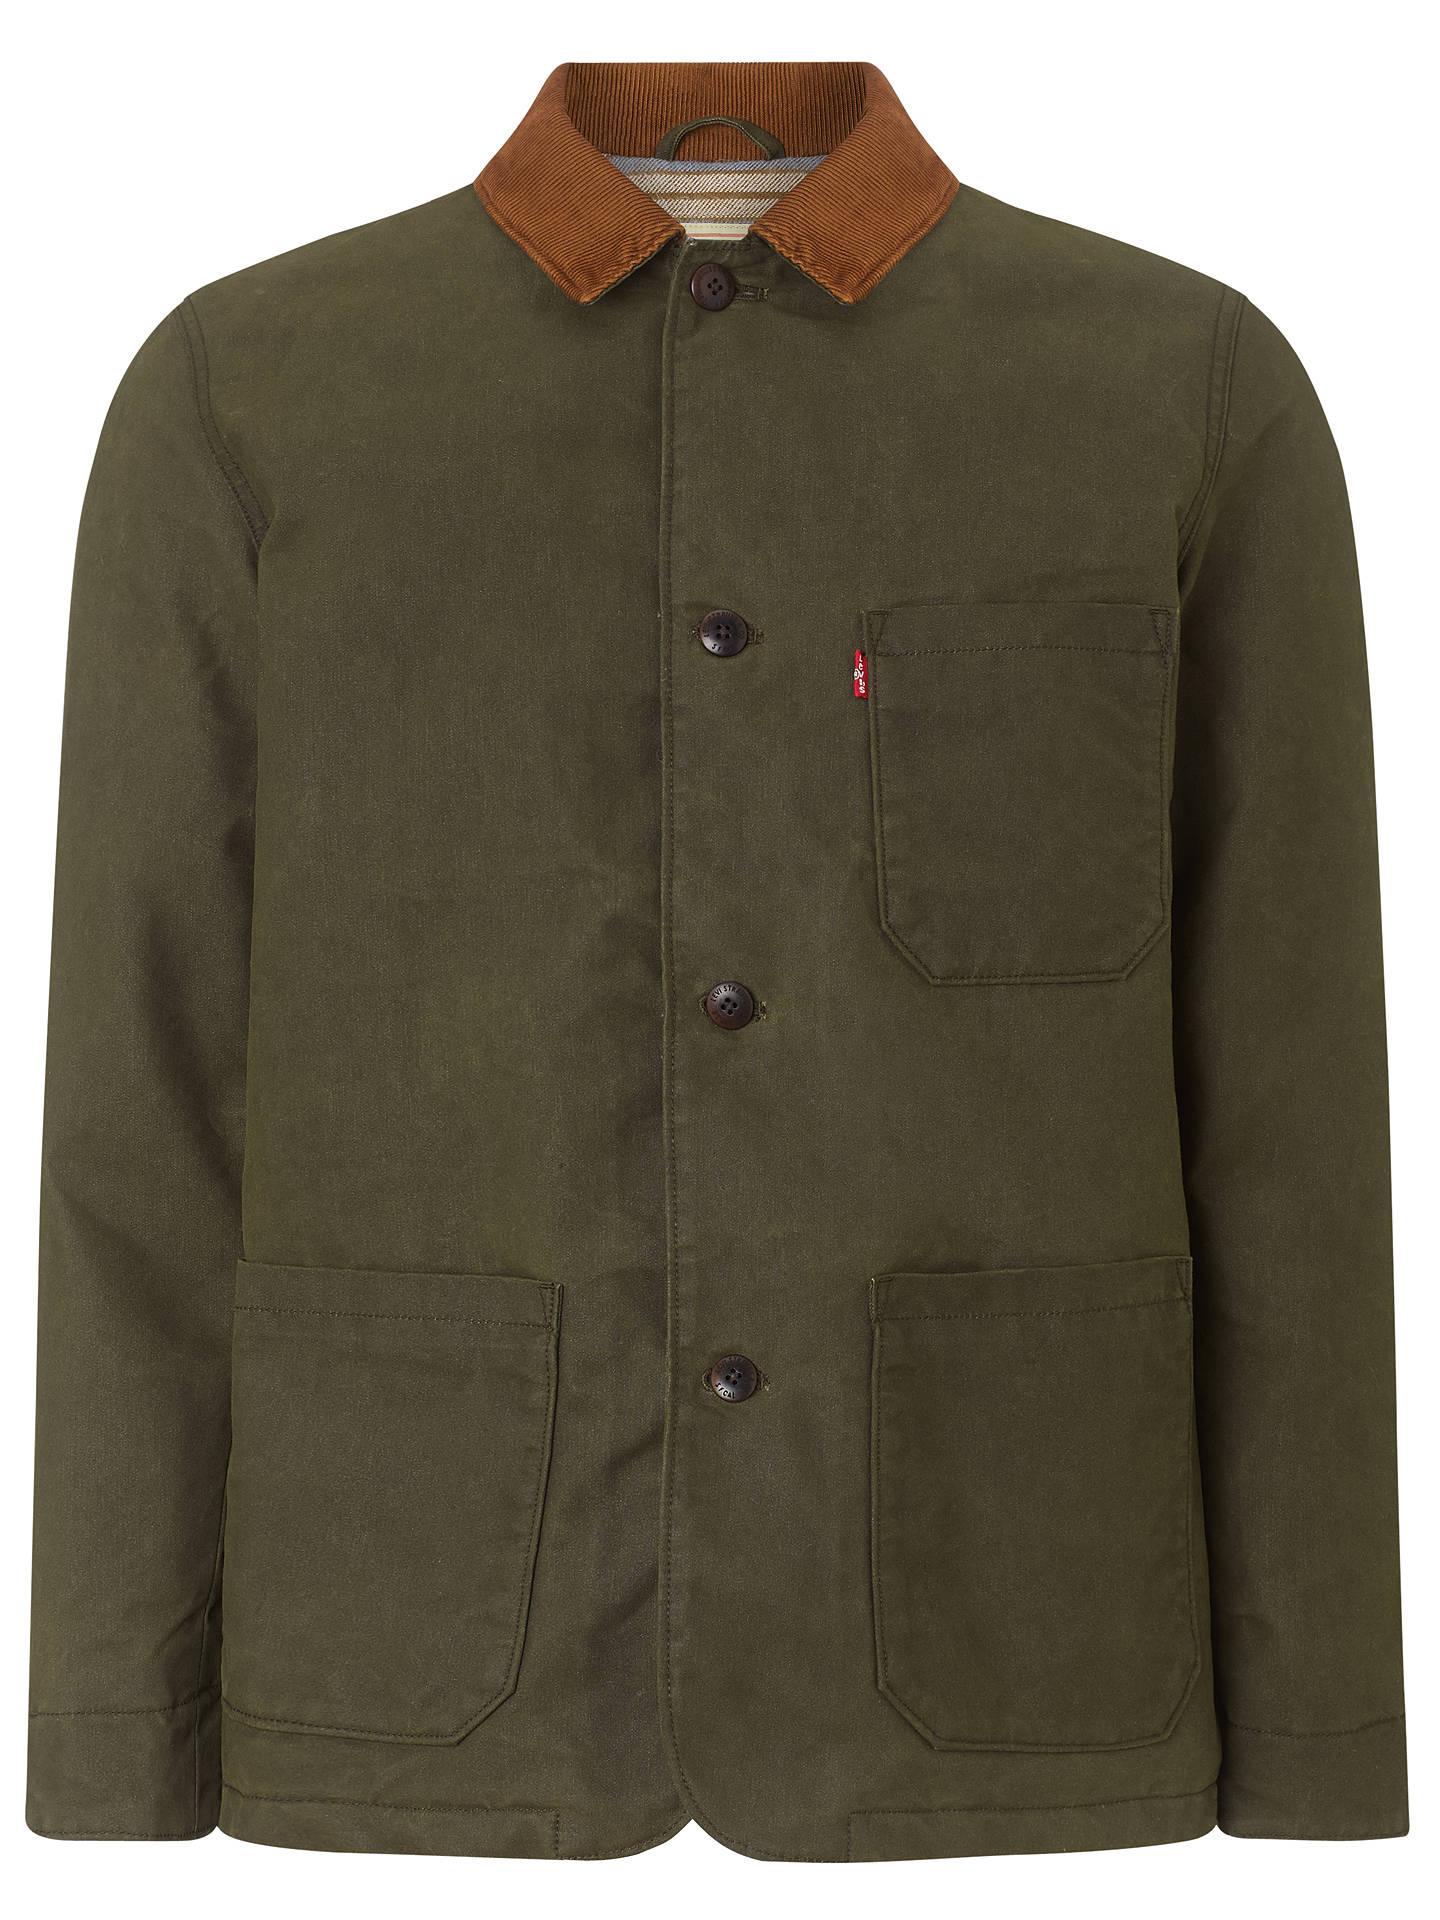 c9235b538 Buy Levi's Engineered Coat Wax Cotton Mix Jacket, Rosin, S Online at  johnlewis.